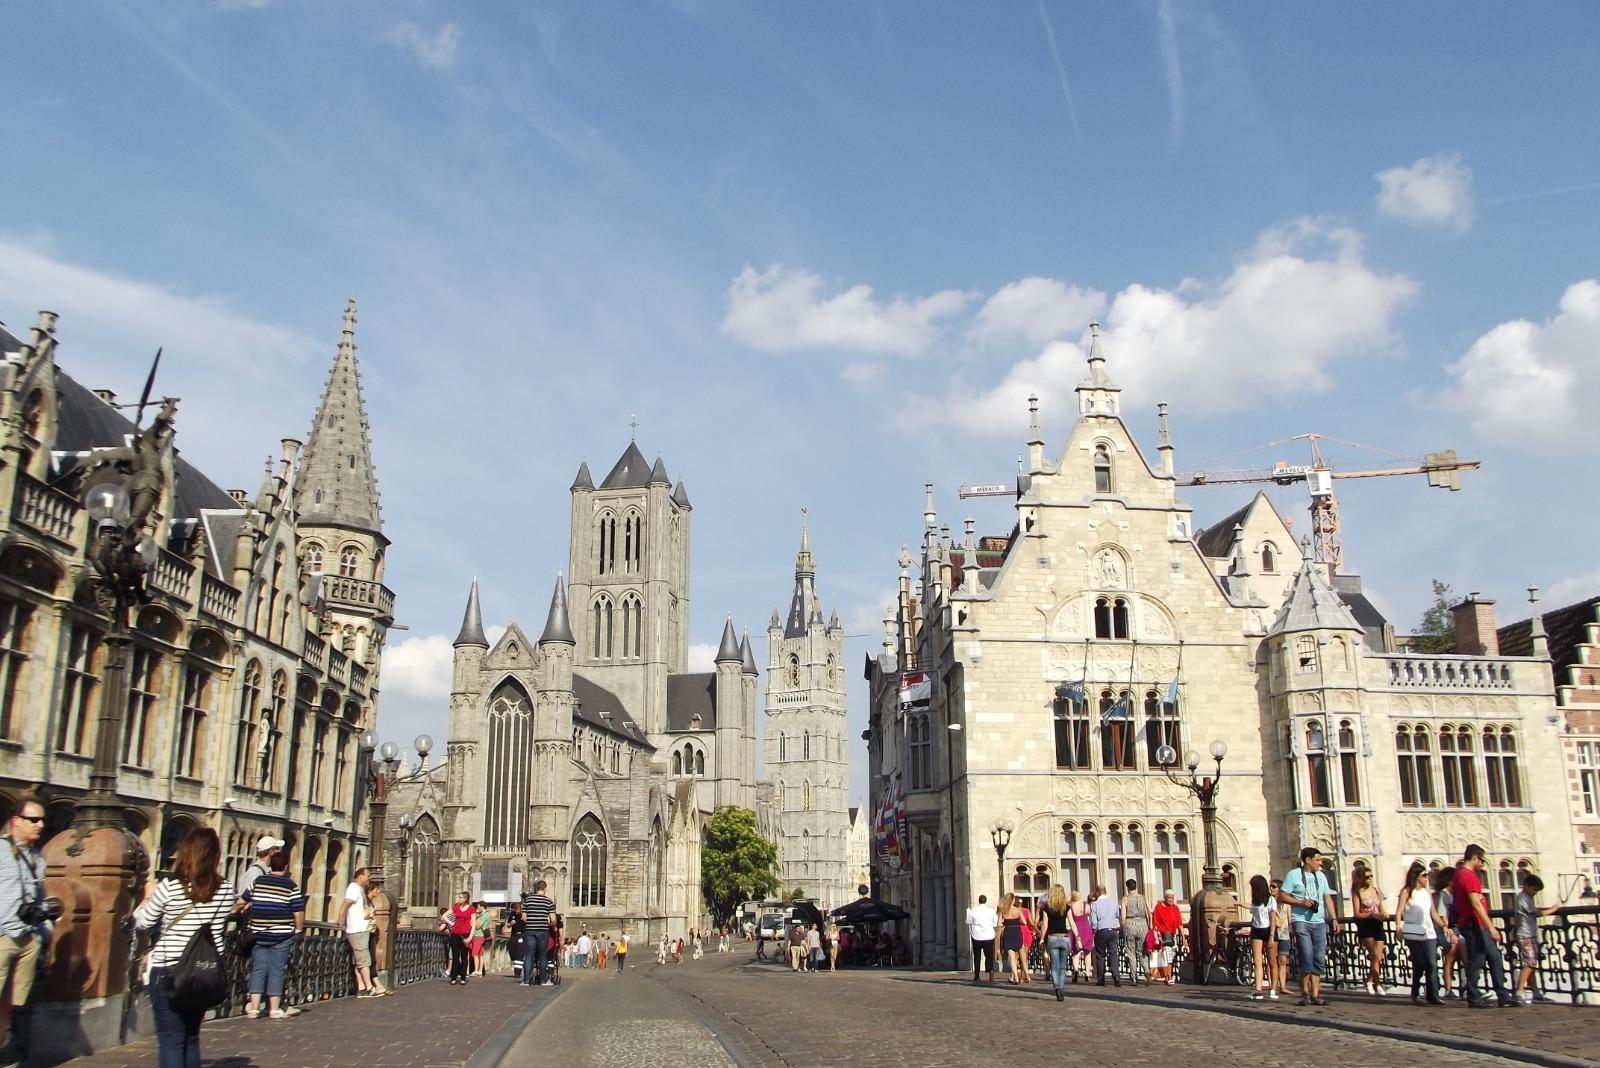 belgioelussemburgo41-1600419039.jpg